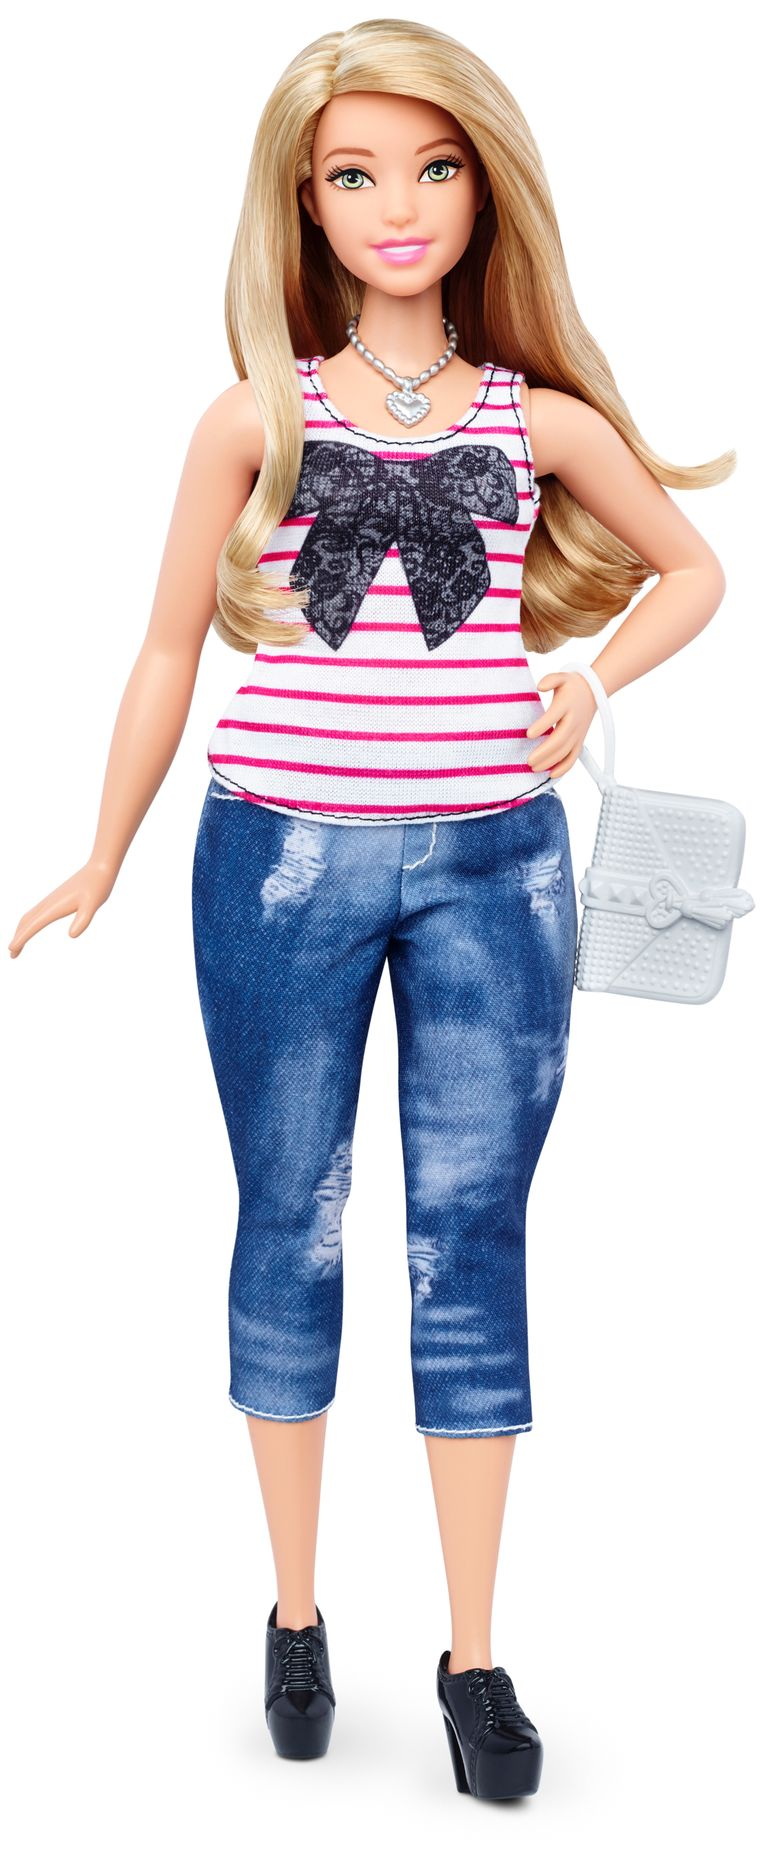 Curvy Barbie Beeld Mattel